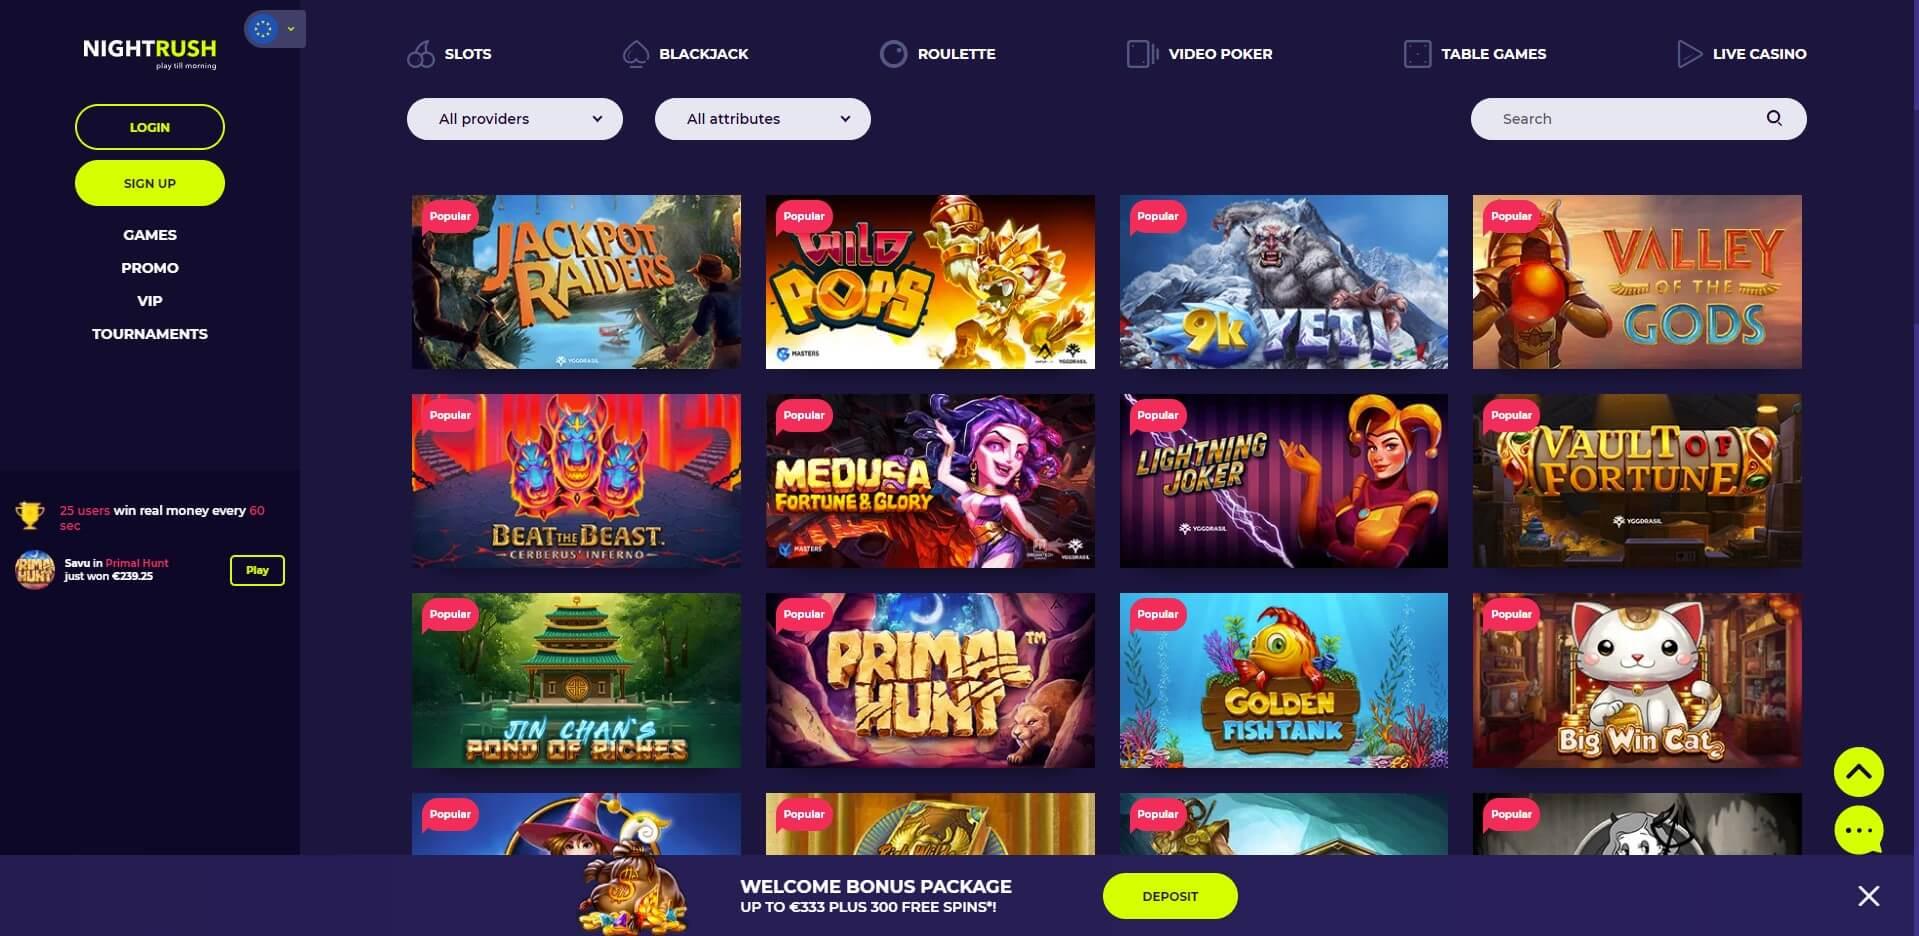 Games at NightRush Casino